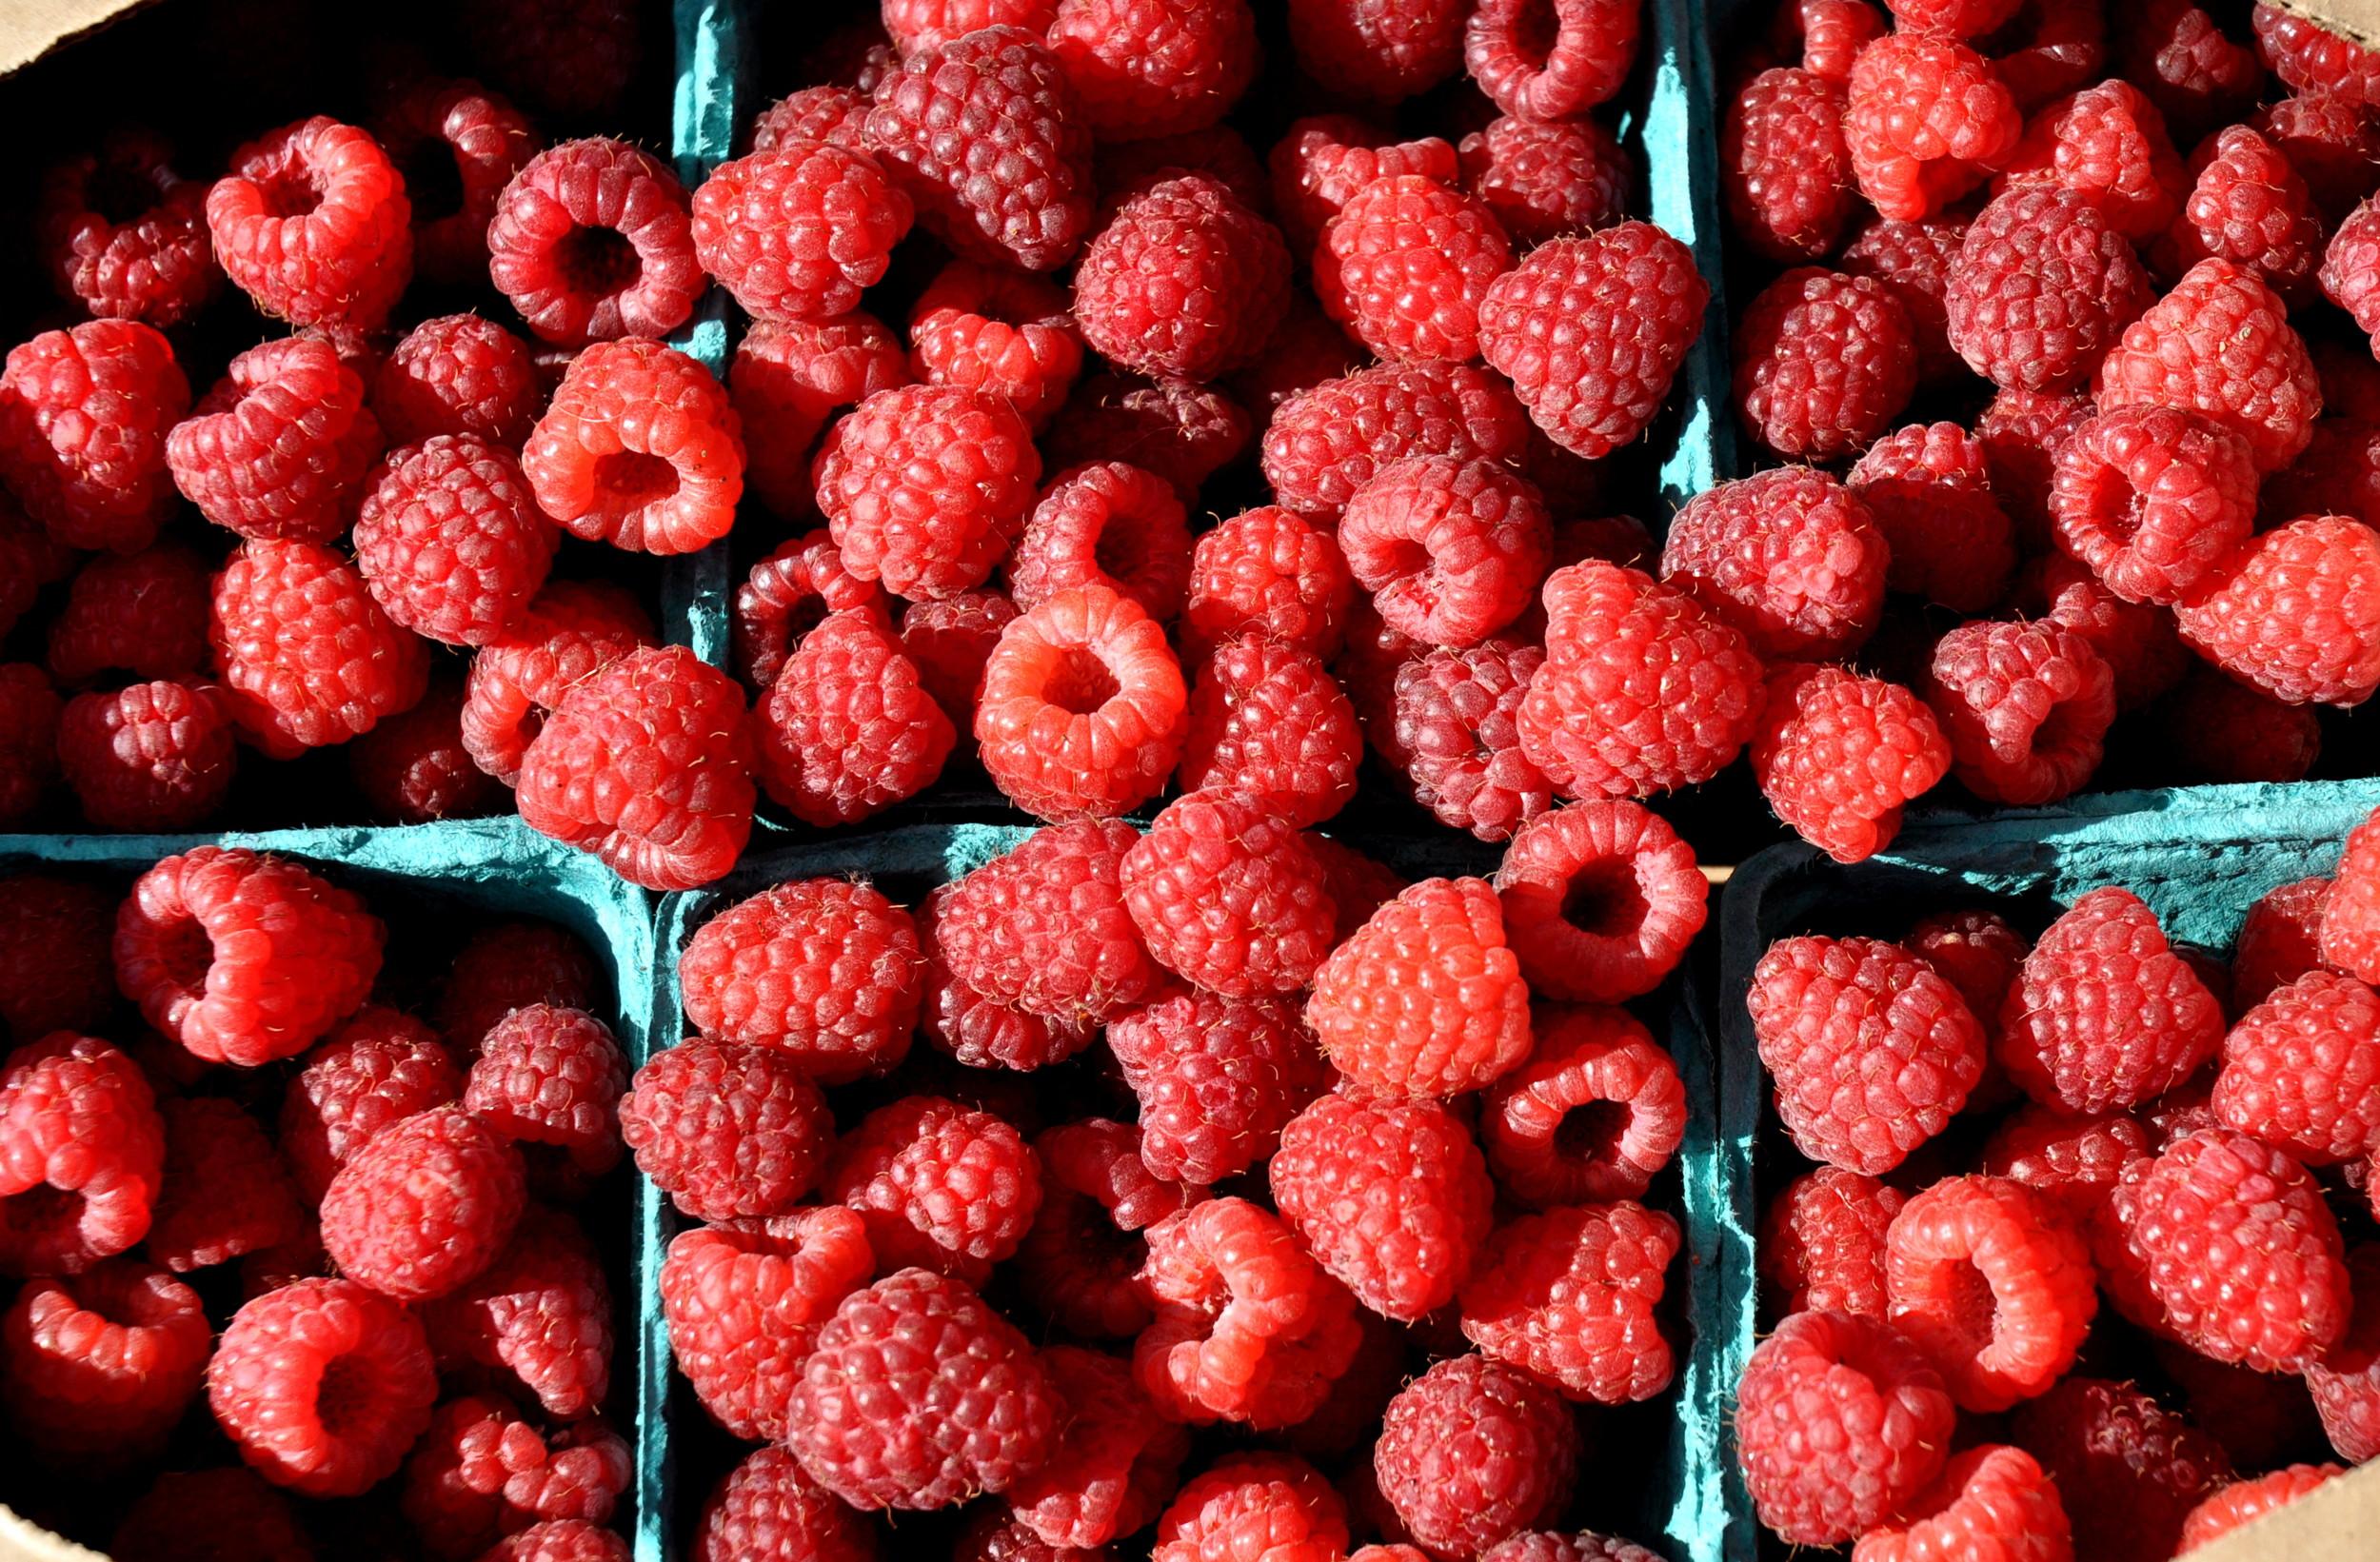 Raspberries from Gaia's Harmony Farm. Photo copyright 2013 by Zachary D. Lyons.